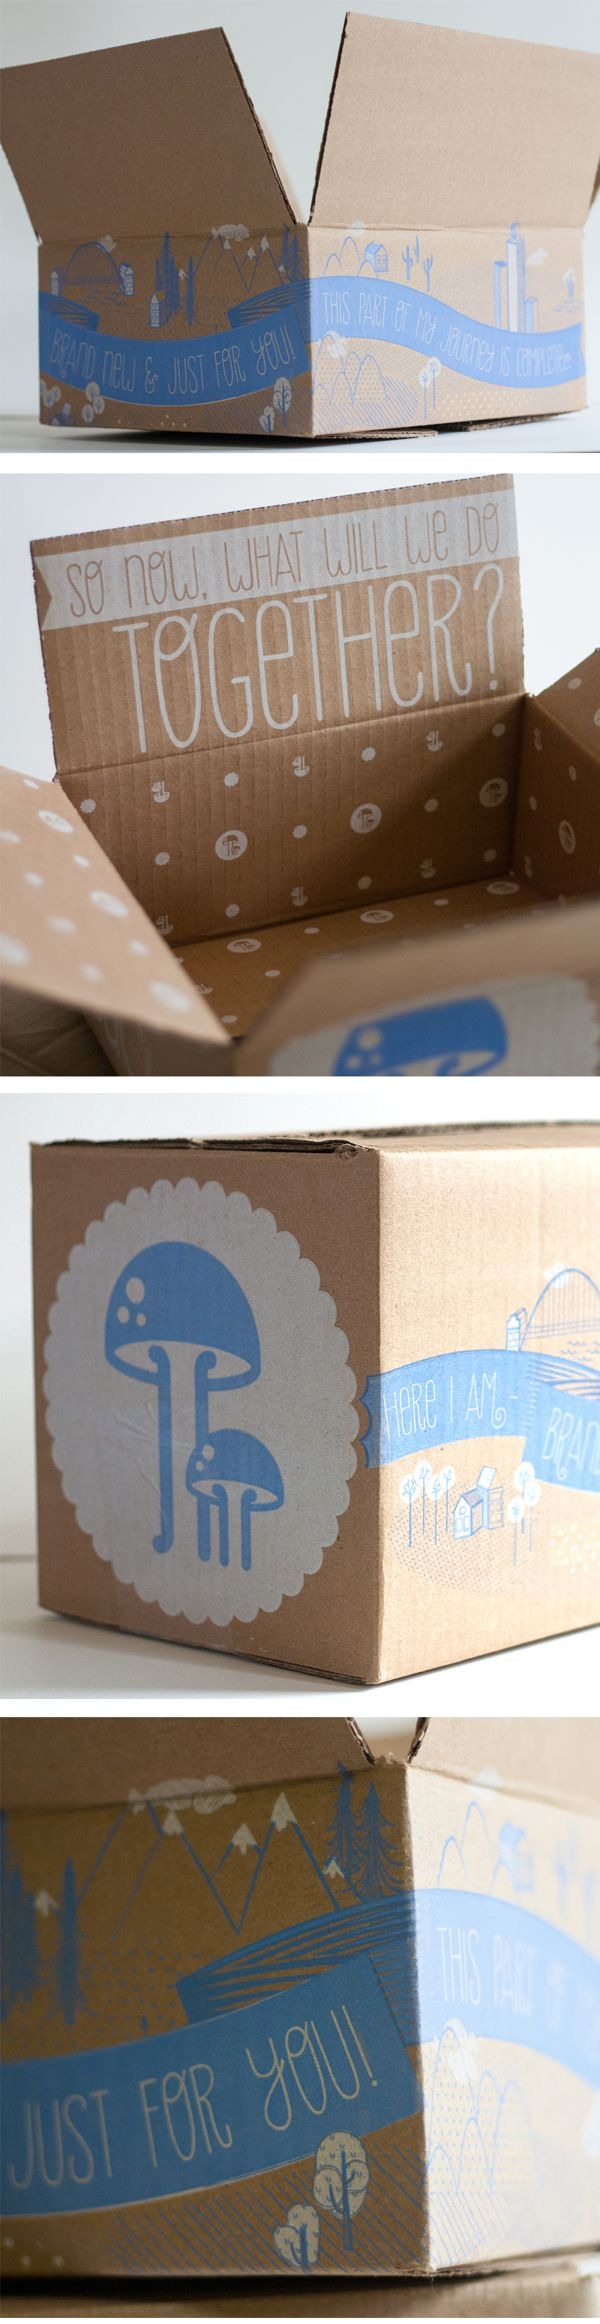 ModCloth 2012 Shipping Boxes by Joseph DeFerrari, via Behance